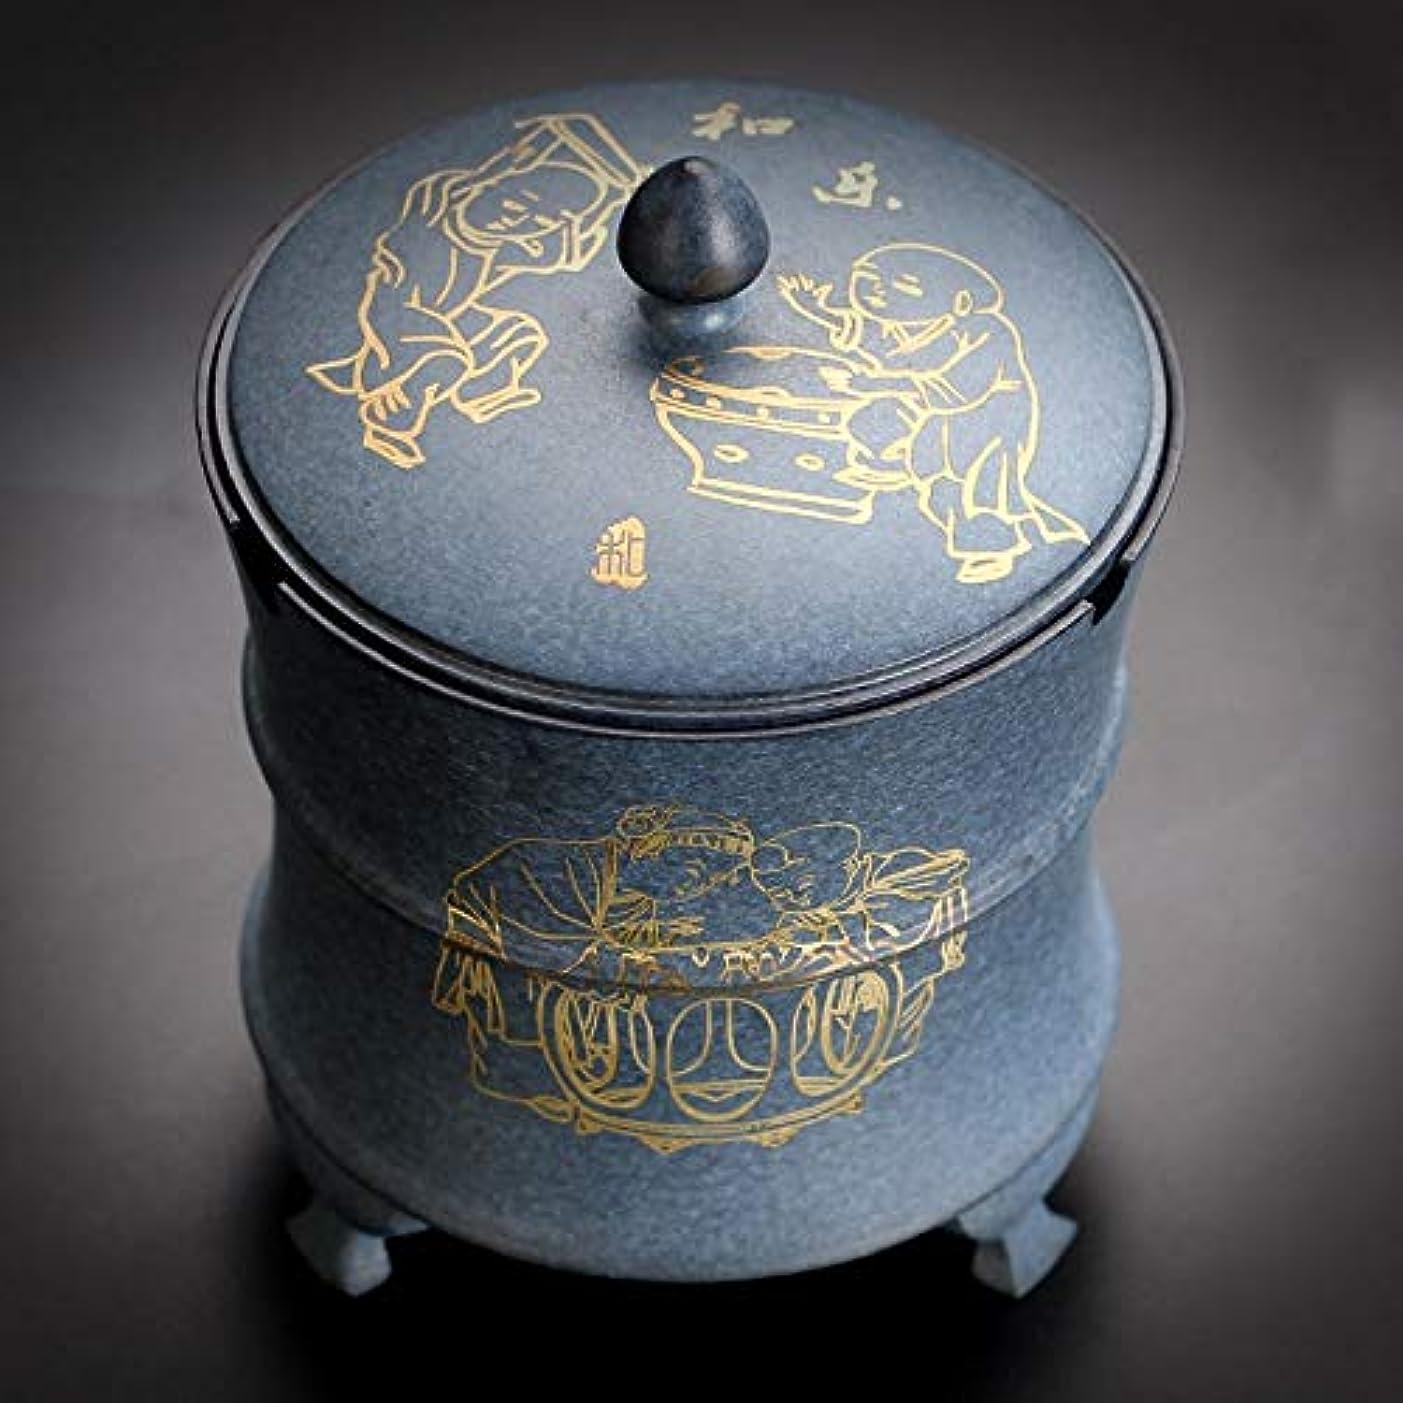 頼む一晩受賞純銅灰皿銅工芸品居間研究室装飾アンティーク灰皿装飾品